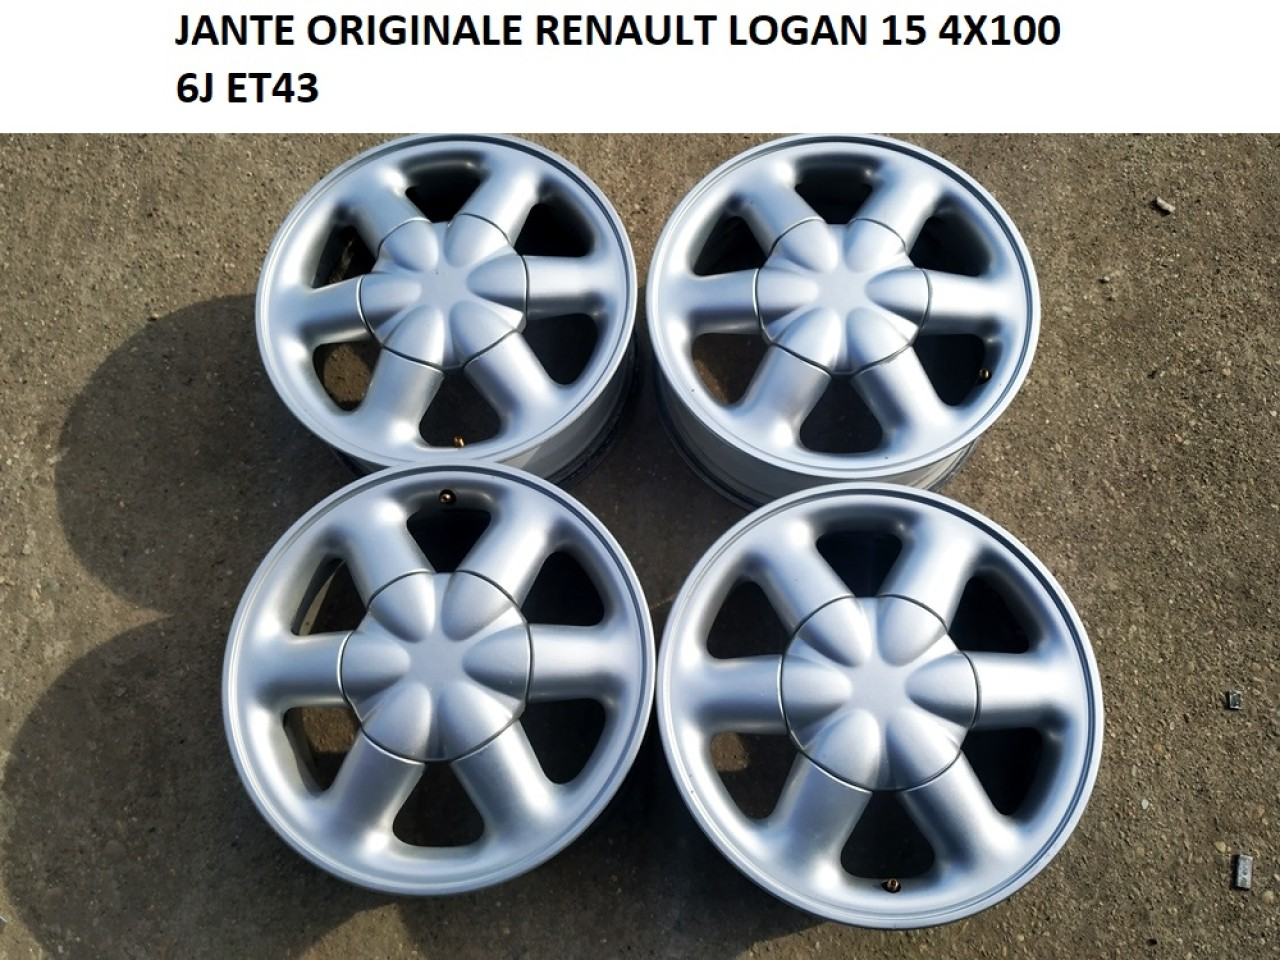 JANTE RENAULT LOGAN 15 4X100